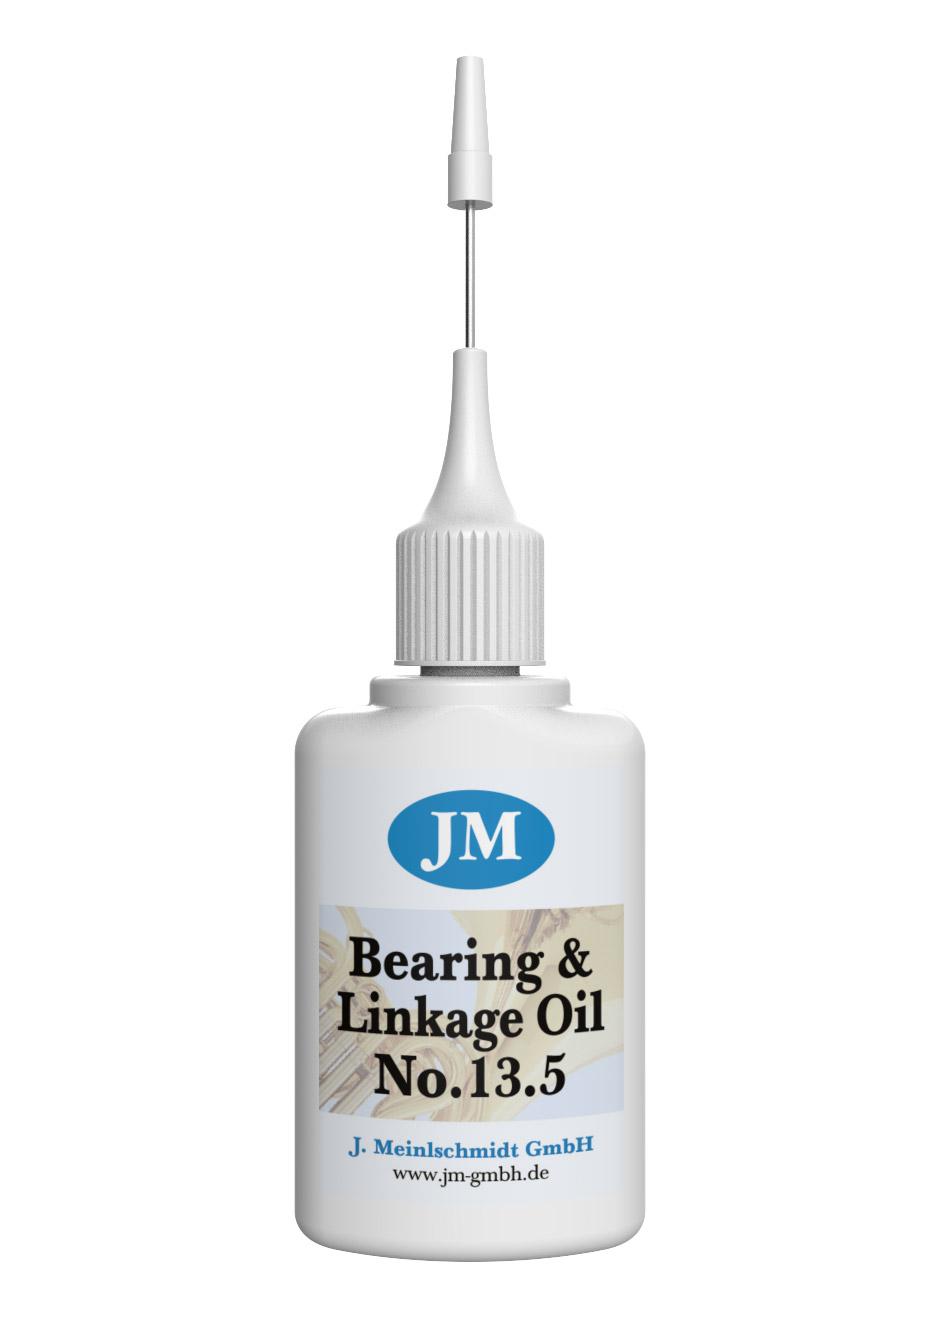 JM Bearing & Linkage Oil 13,5 - Synthetic